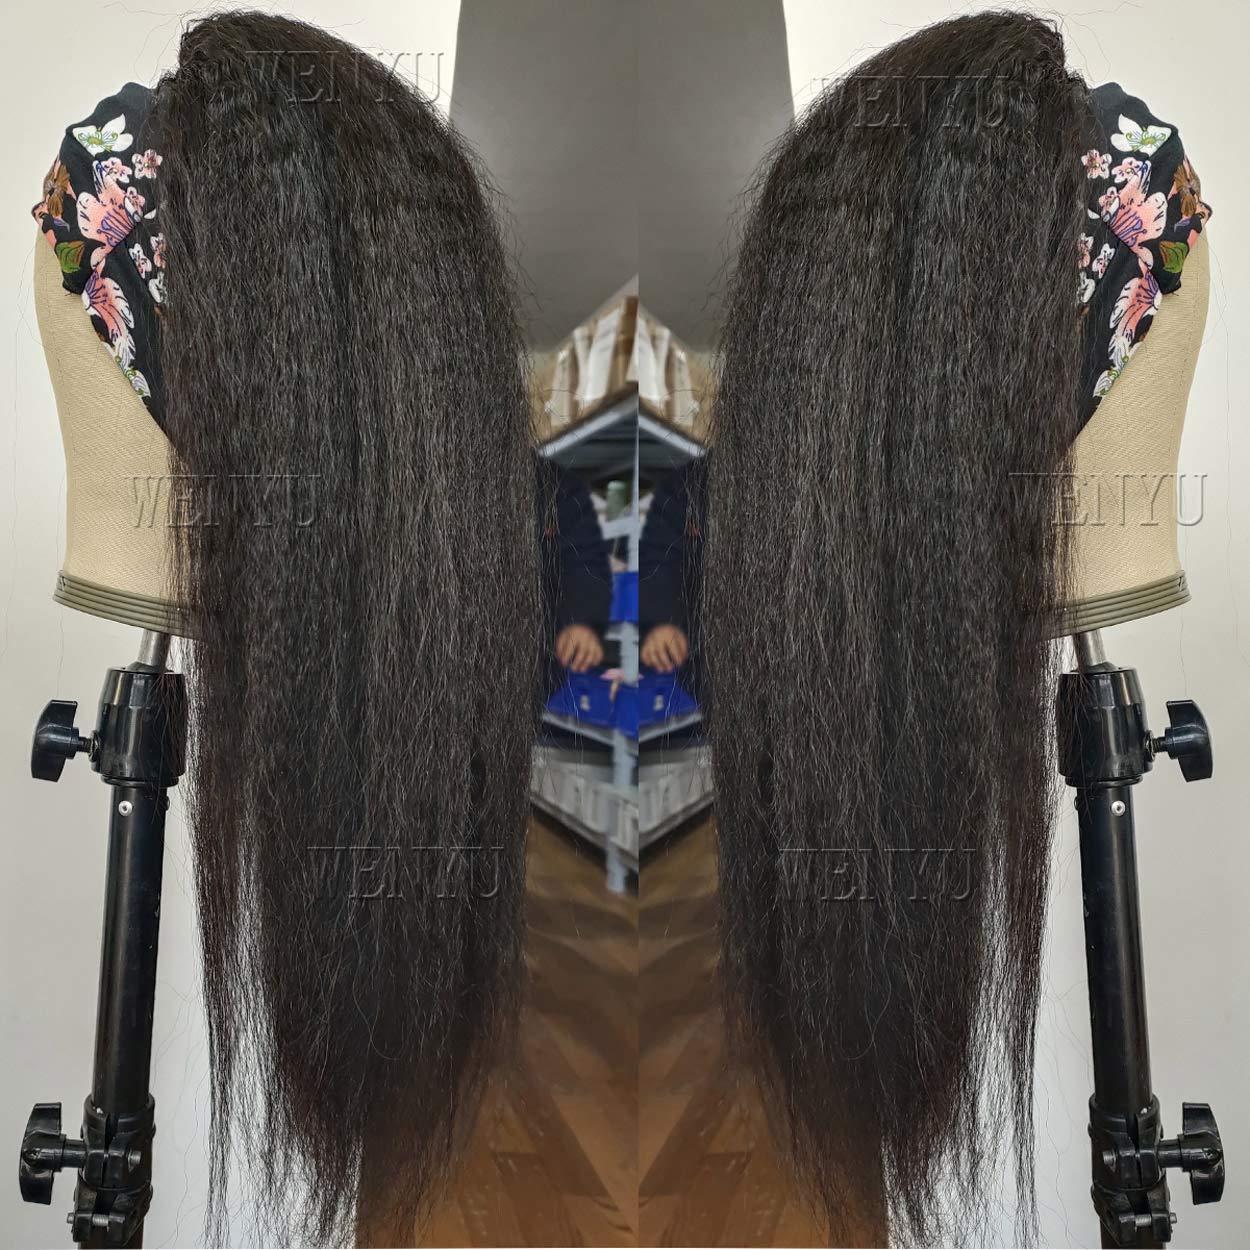 WENYU Headband Wigs for Black Women Human Hair Kinky Straight Headband Wig Human Hair Curly None Lace Front Wigs Machine Made Briazilian Virgin Hair Wigs 14 Inch